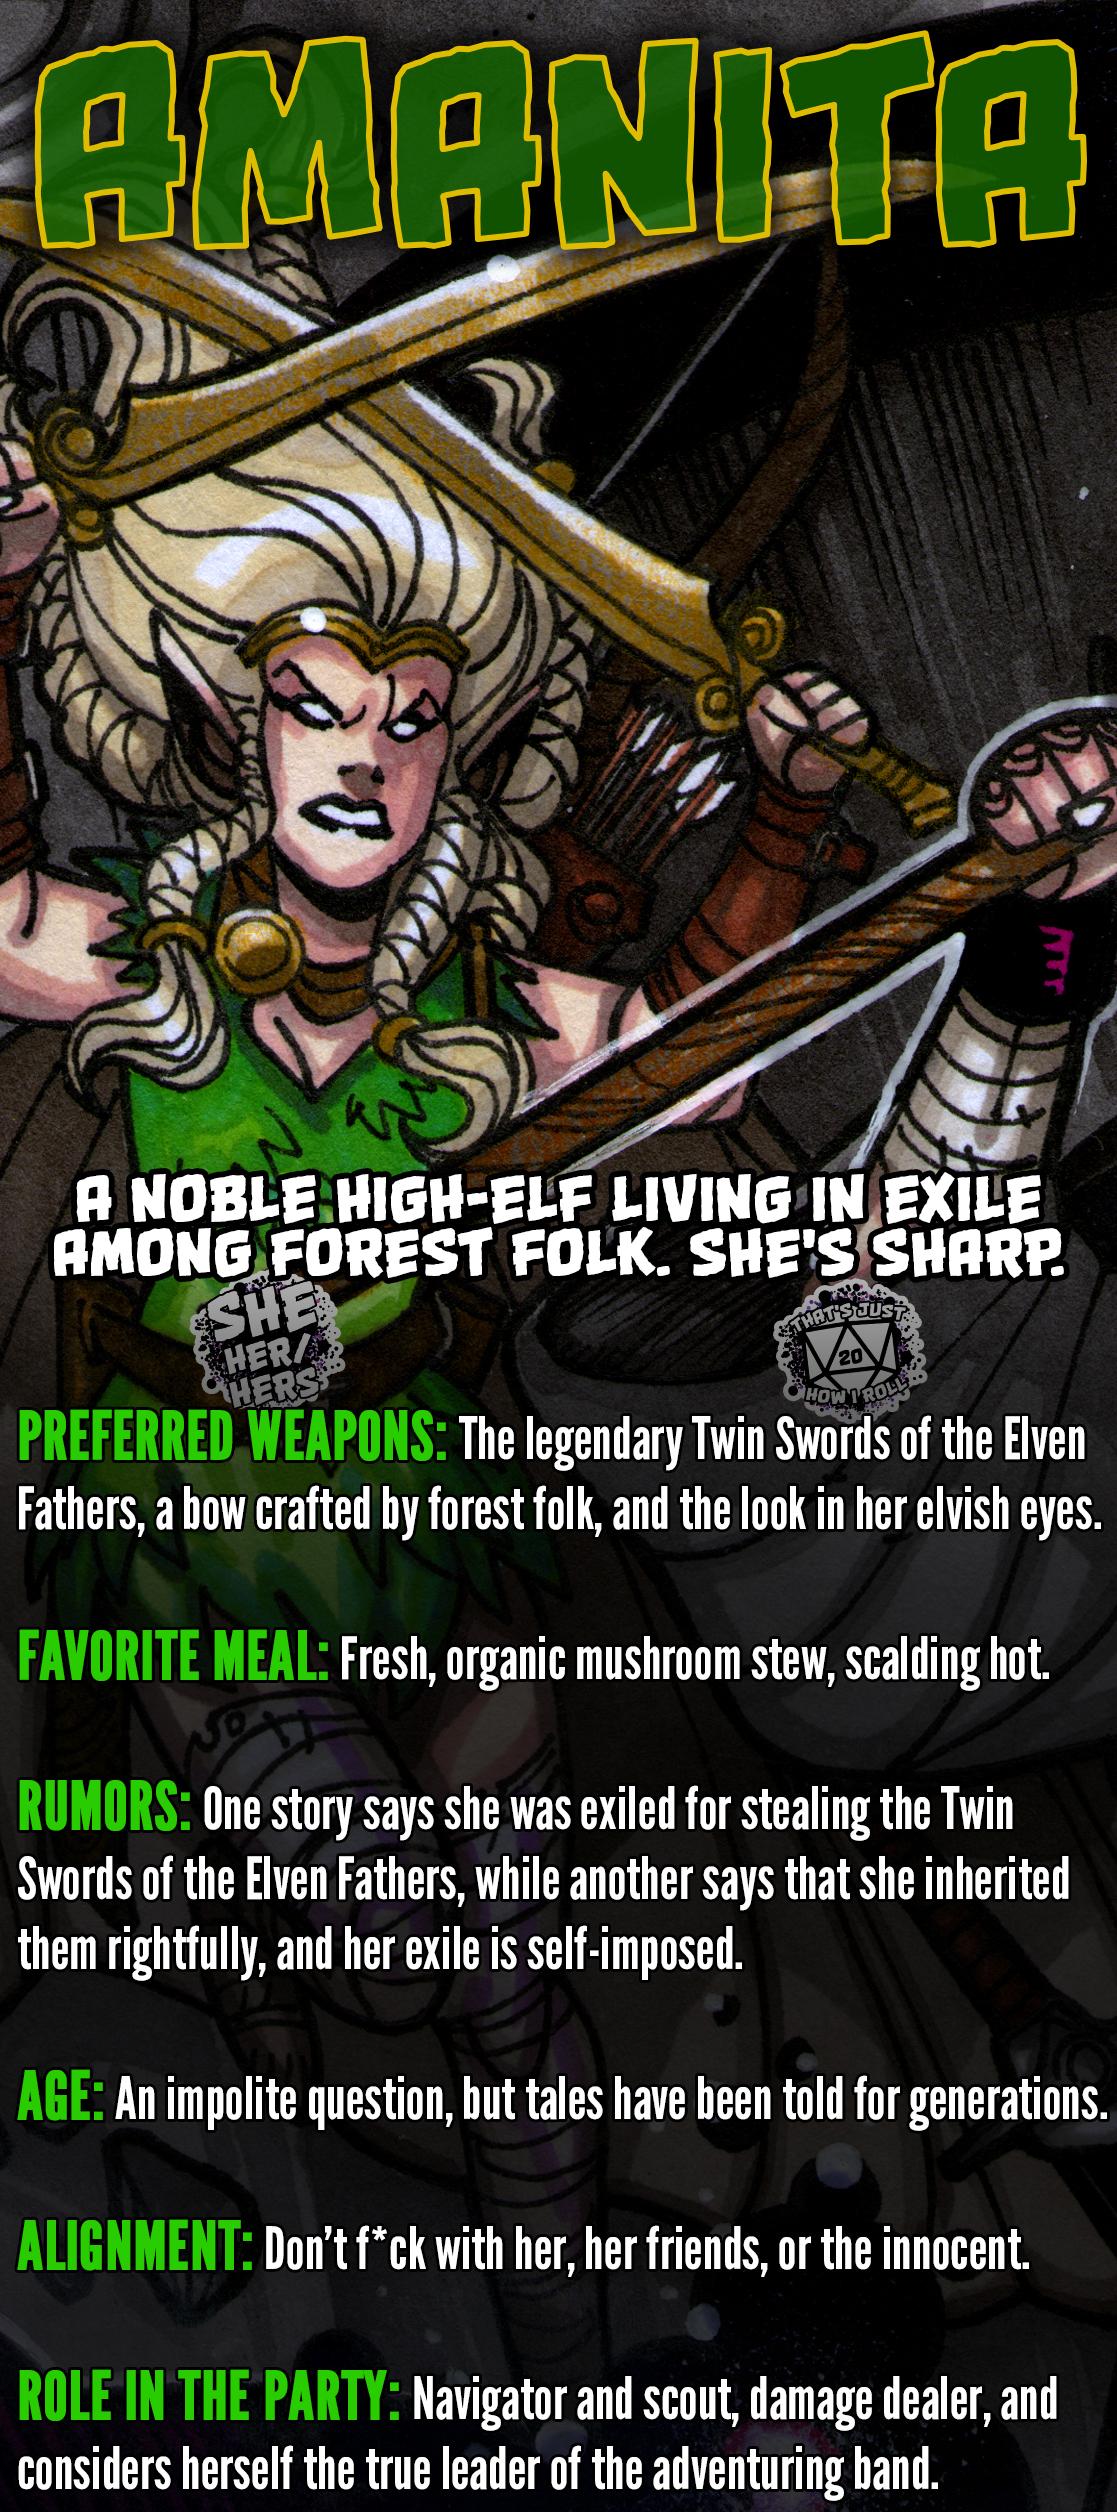 Amanita, high-elf ranger